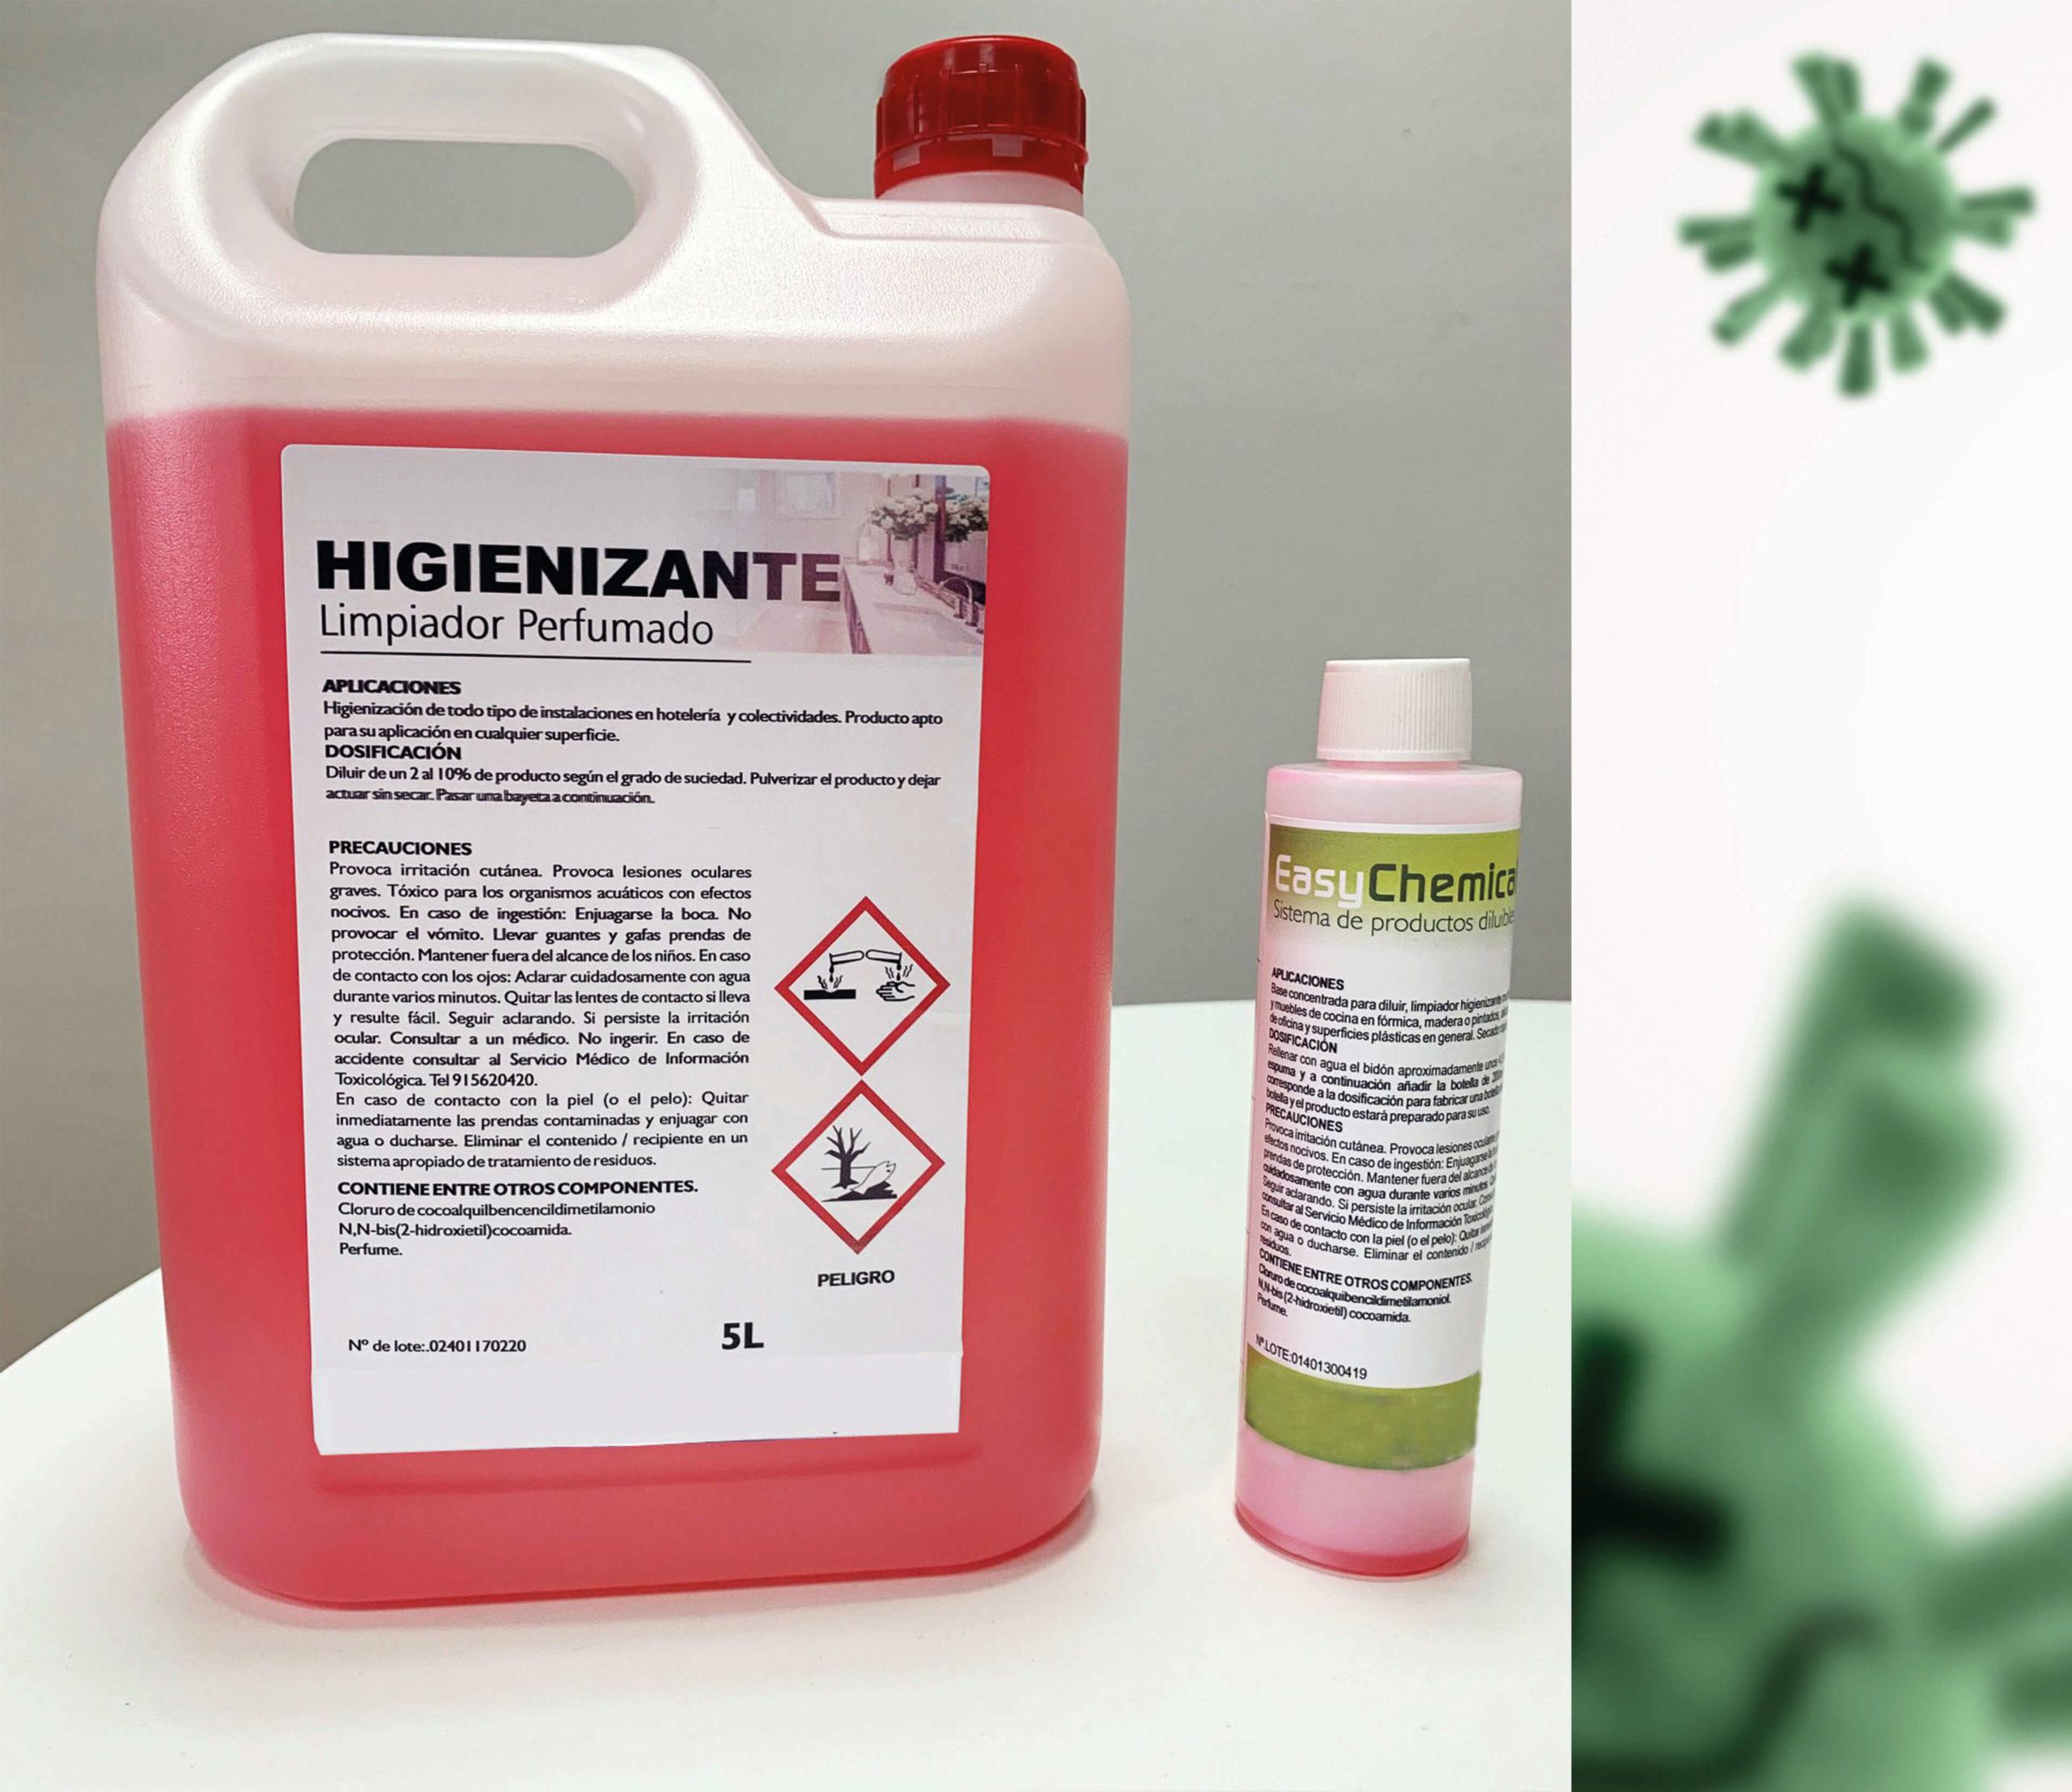 Material Higienizante